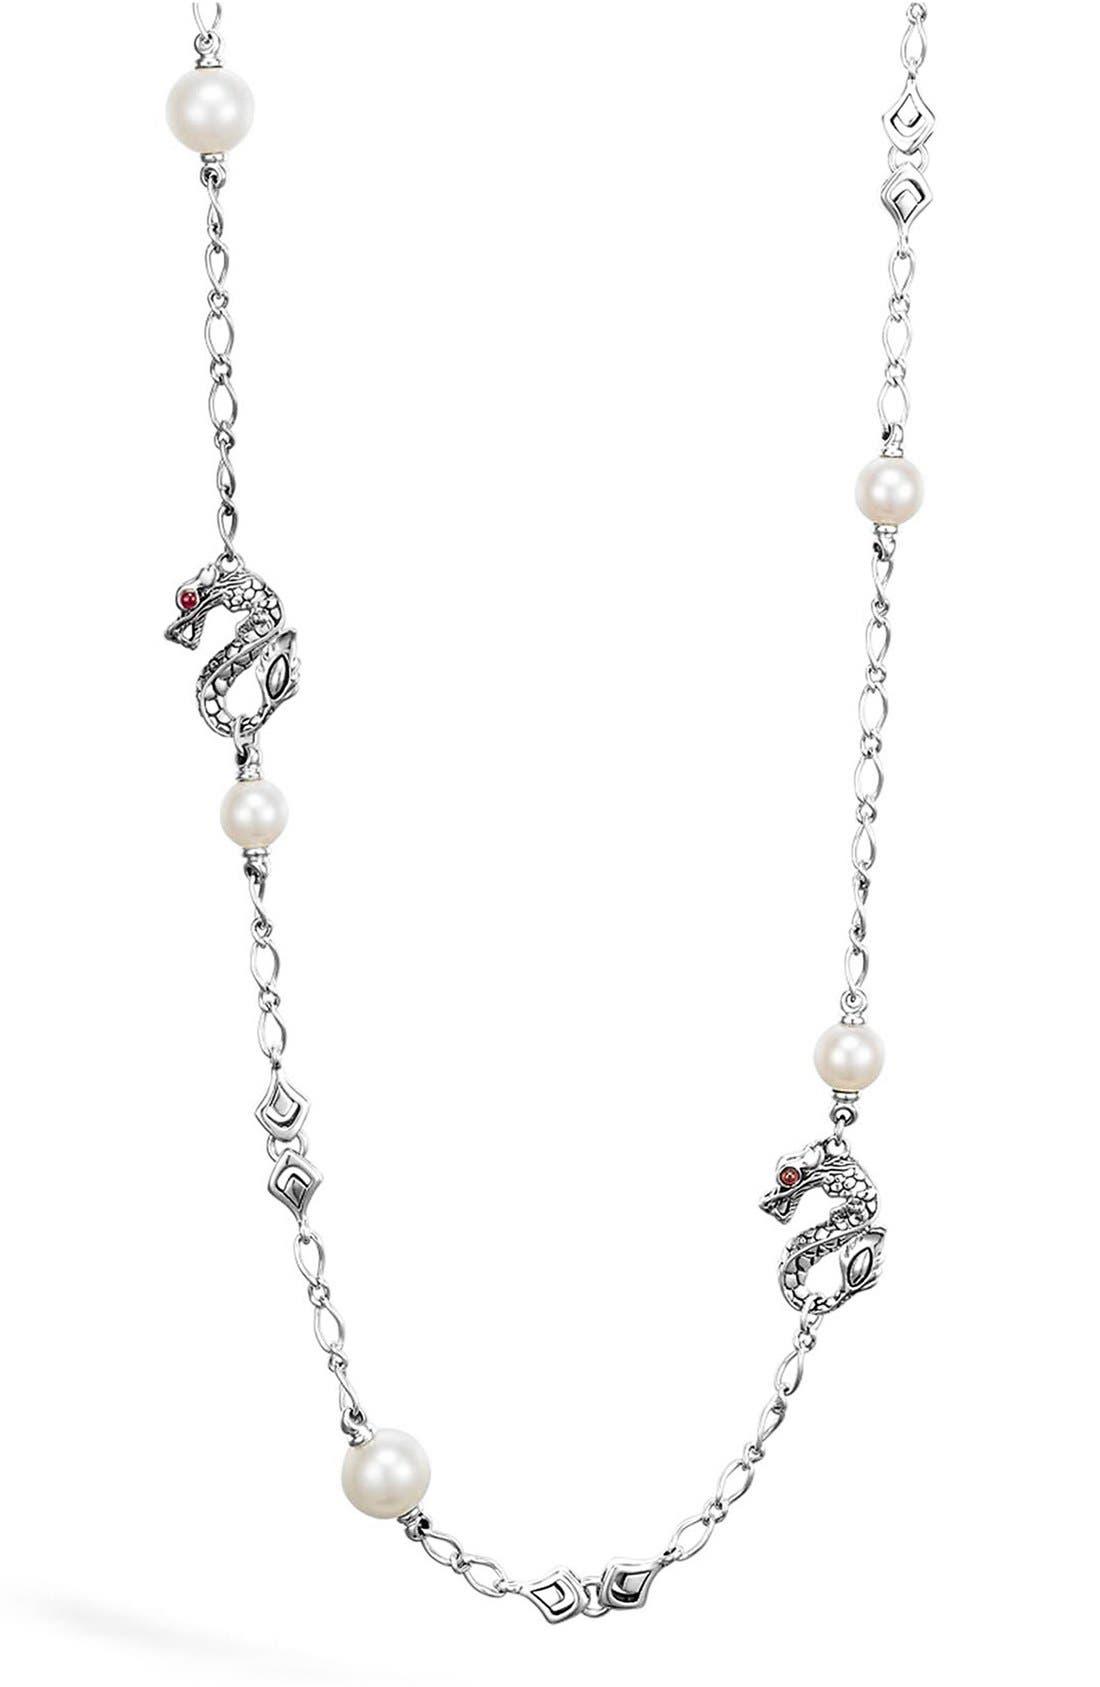 'Naga' Dragon & Pearl Station Necklace,                         Main,                         color, Silver